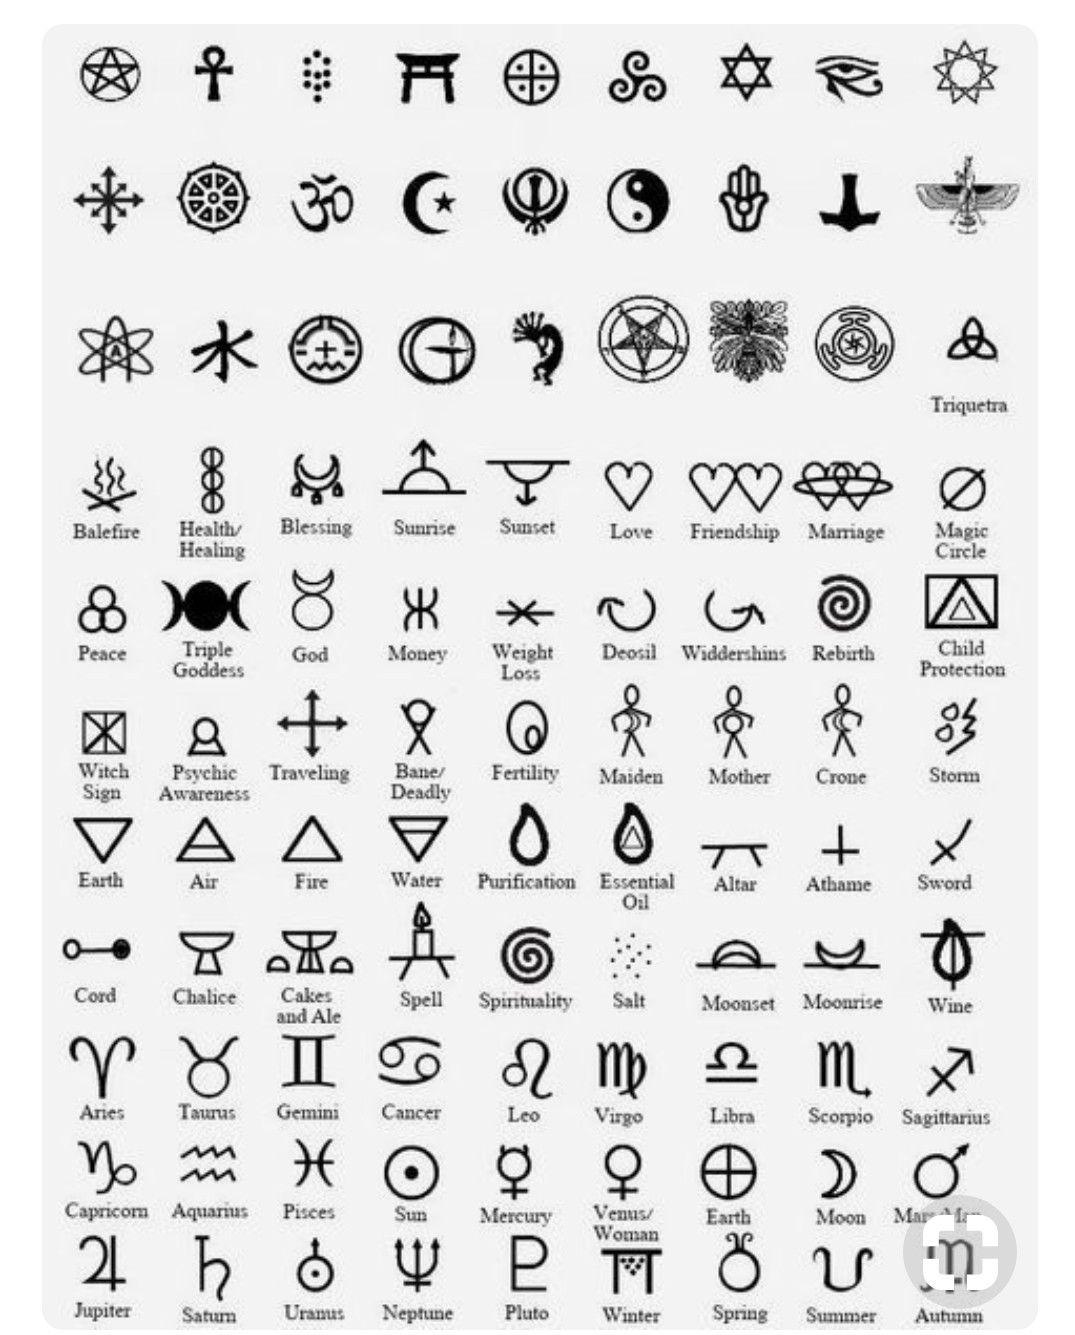 Pin By Missy Pops On Tats Symbolic Tattoos Finger Tattoos Small Tattoos